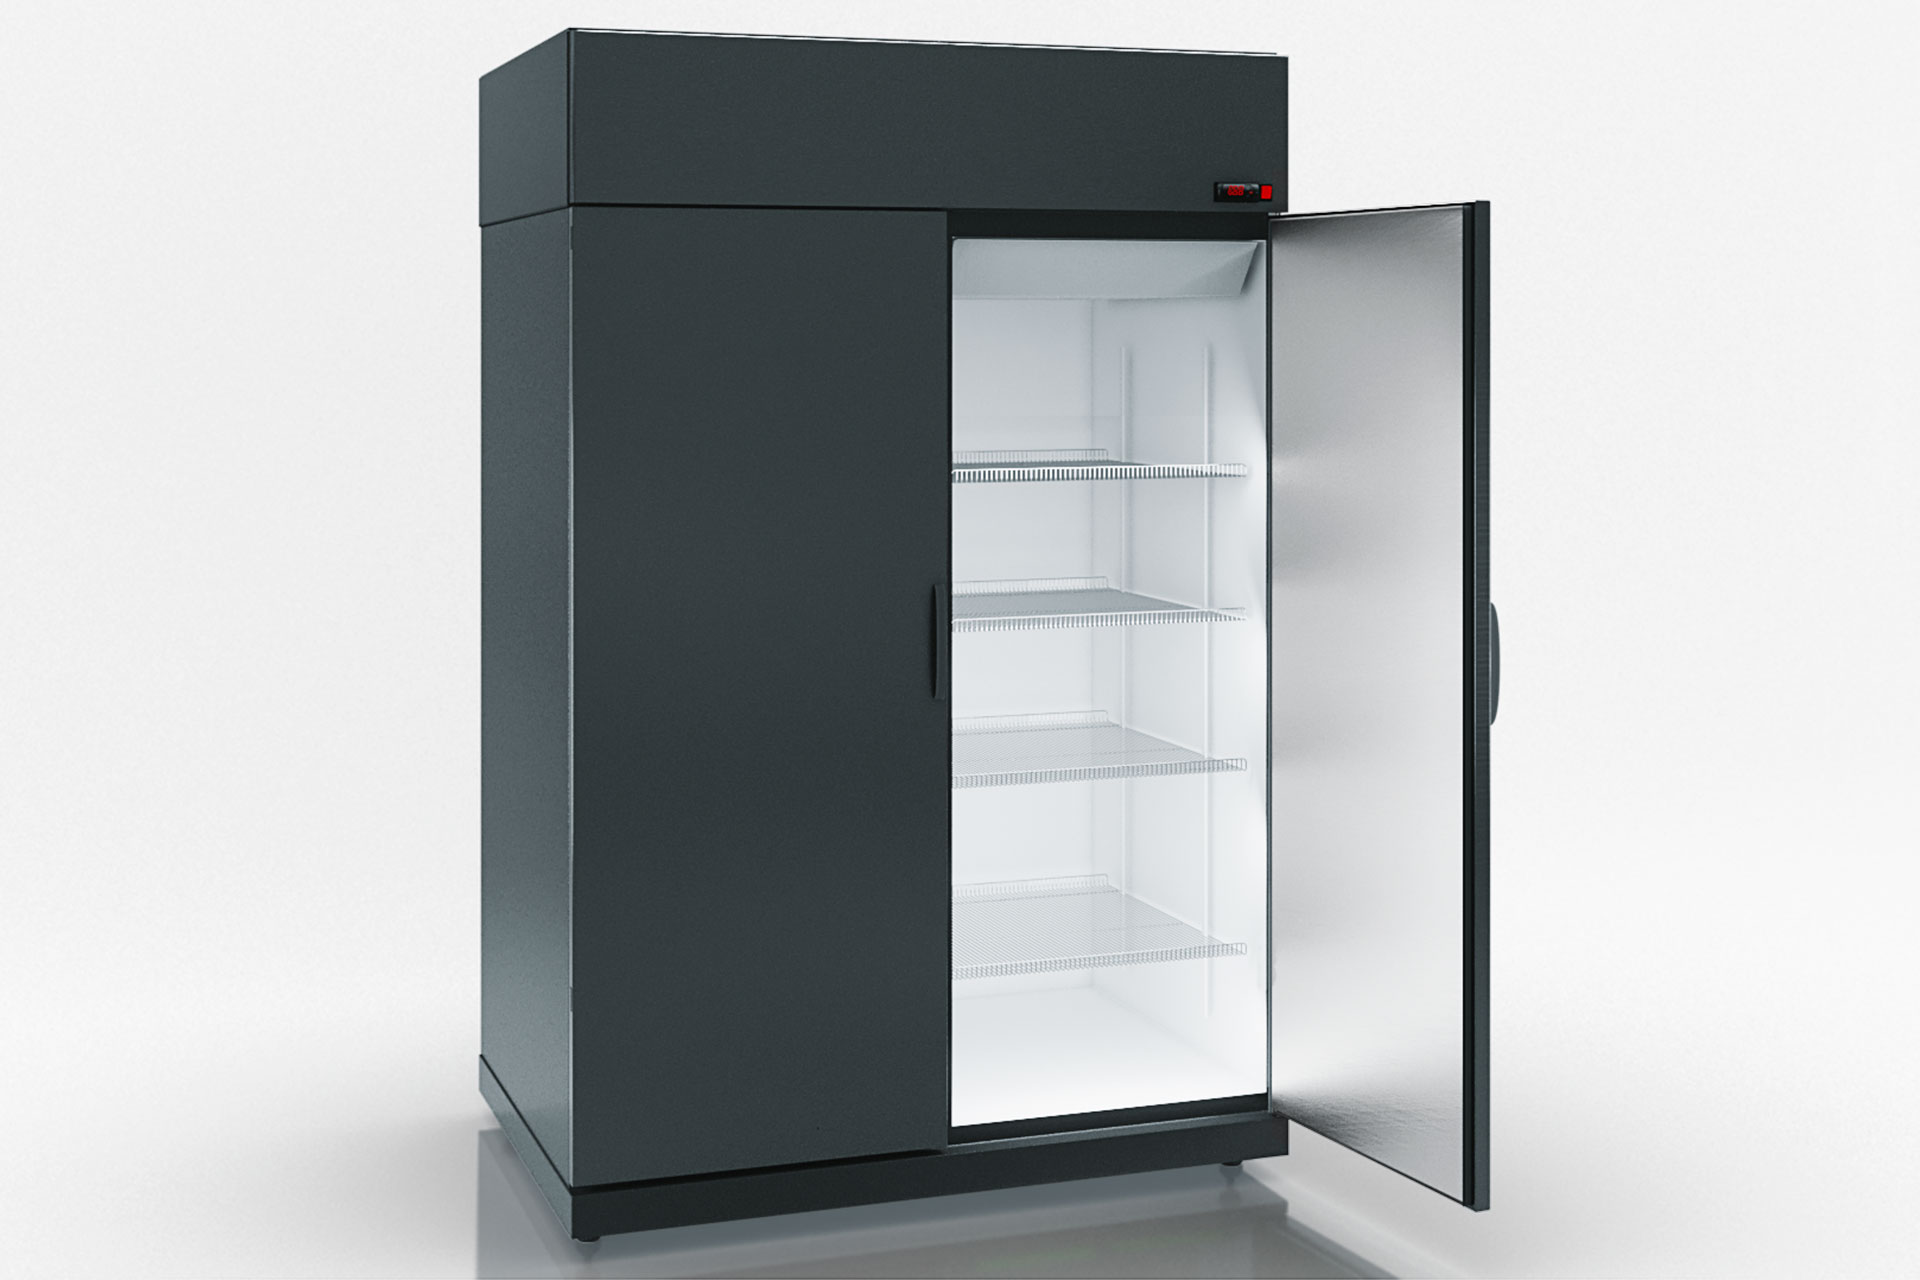 Refrigerated cabinets Kansas VАZG 075 LT 2HD 210-D1200A-132